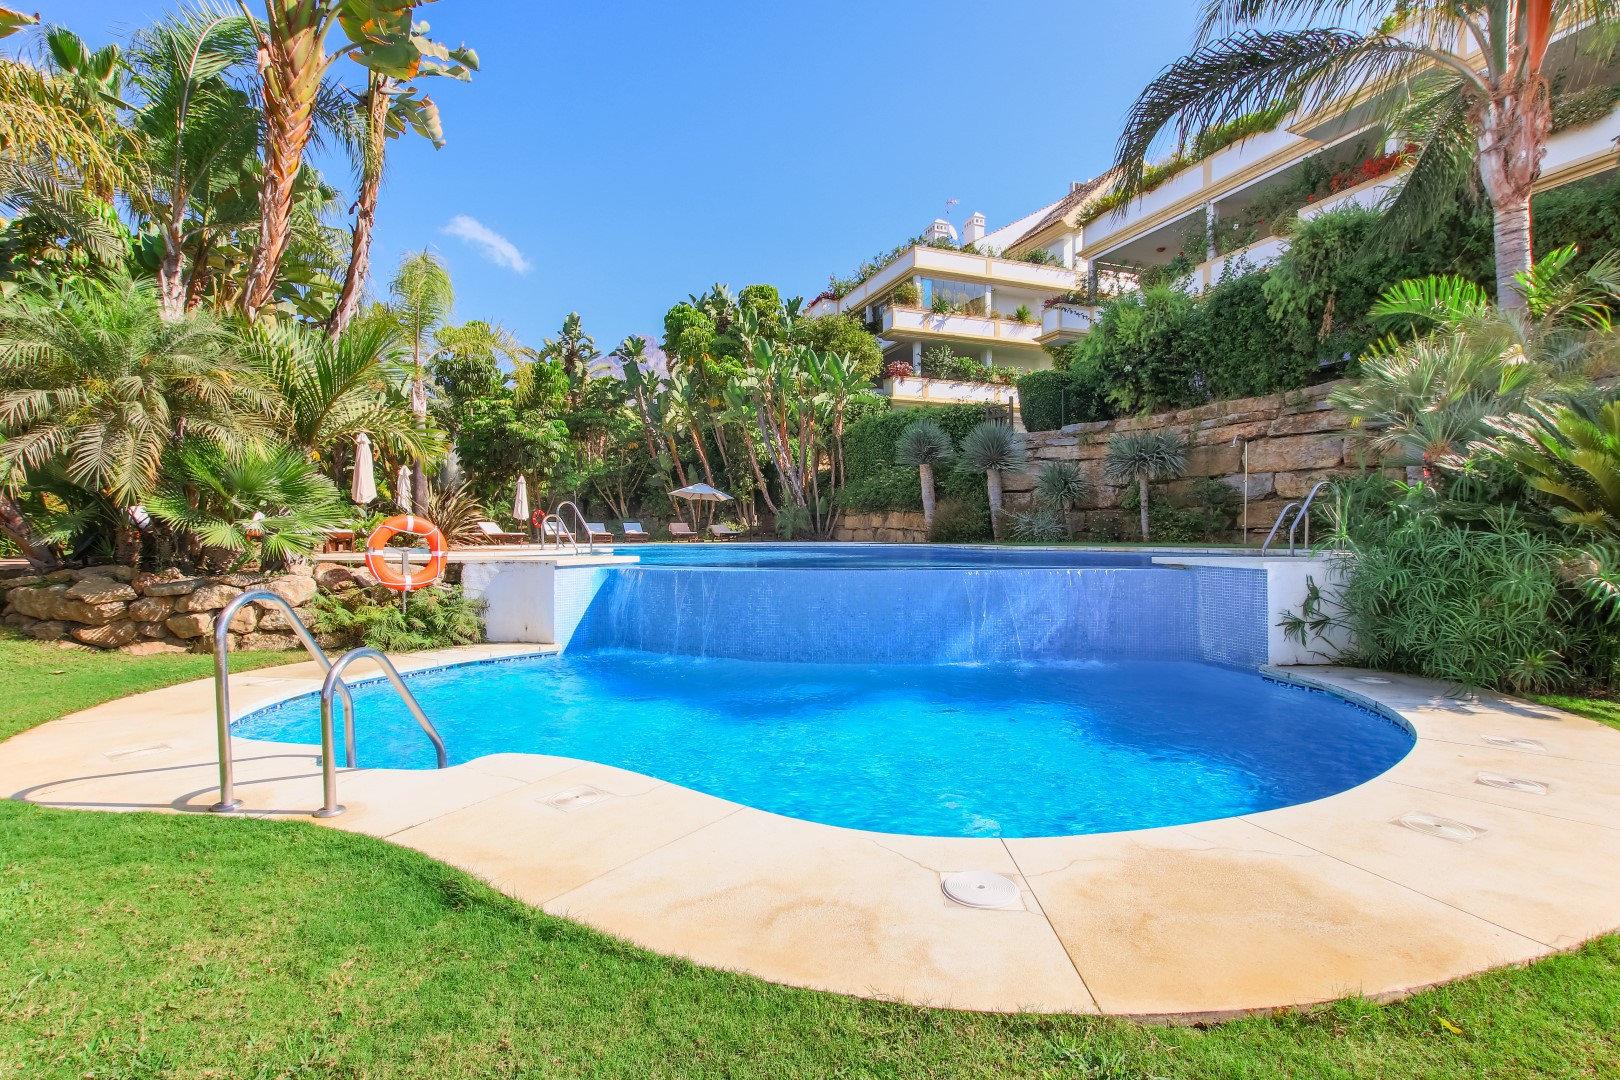 Apartment for sale in Marbella, Lomas del Rey